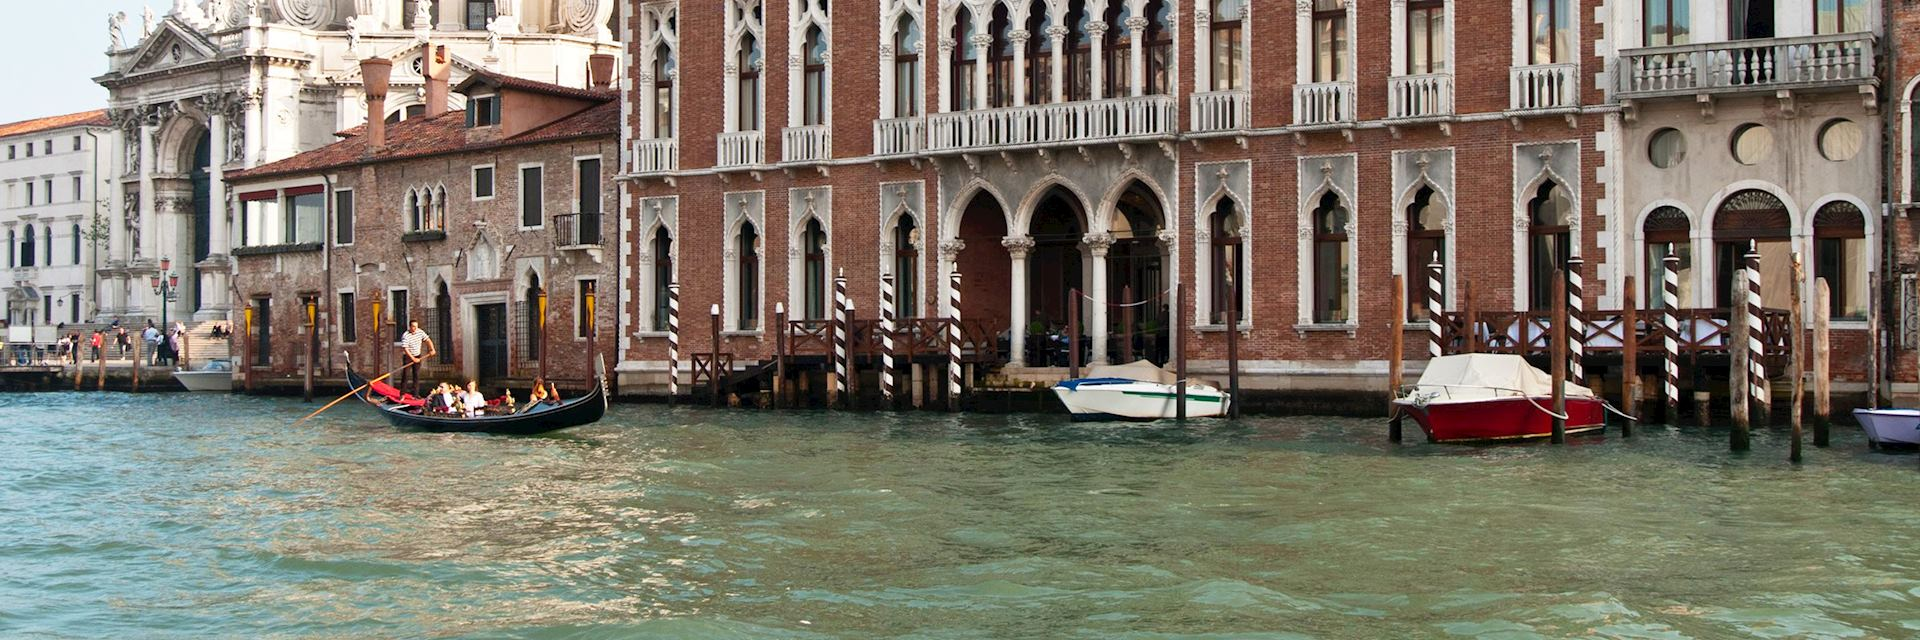 Centurion Palace, Venice